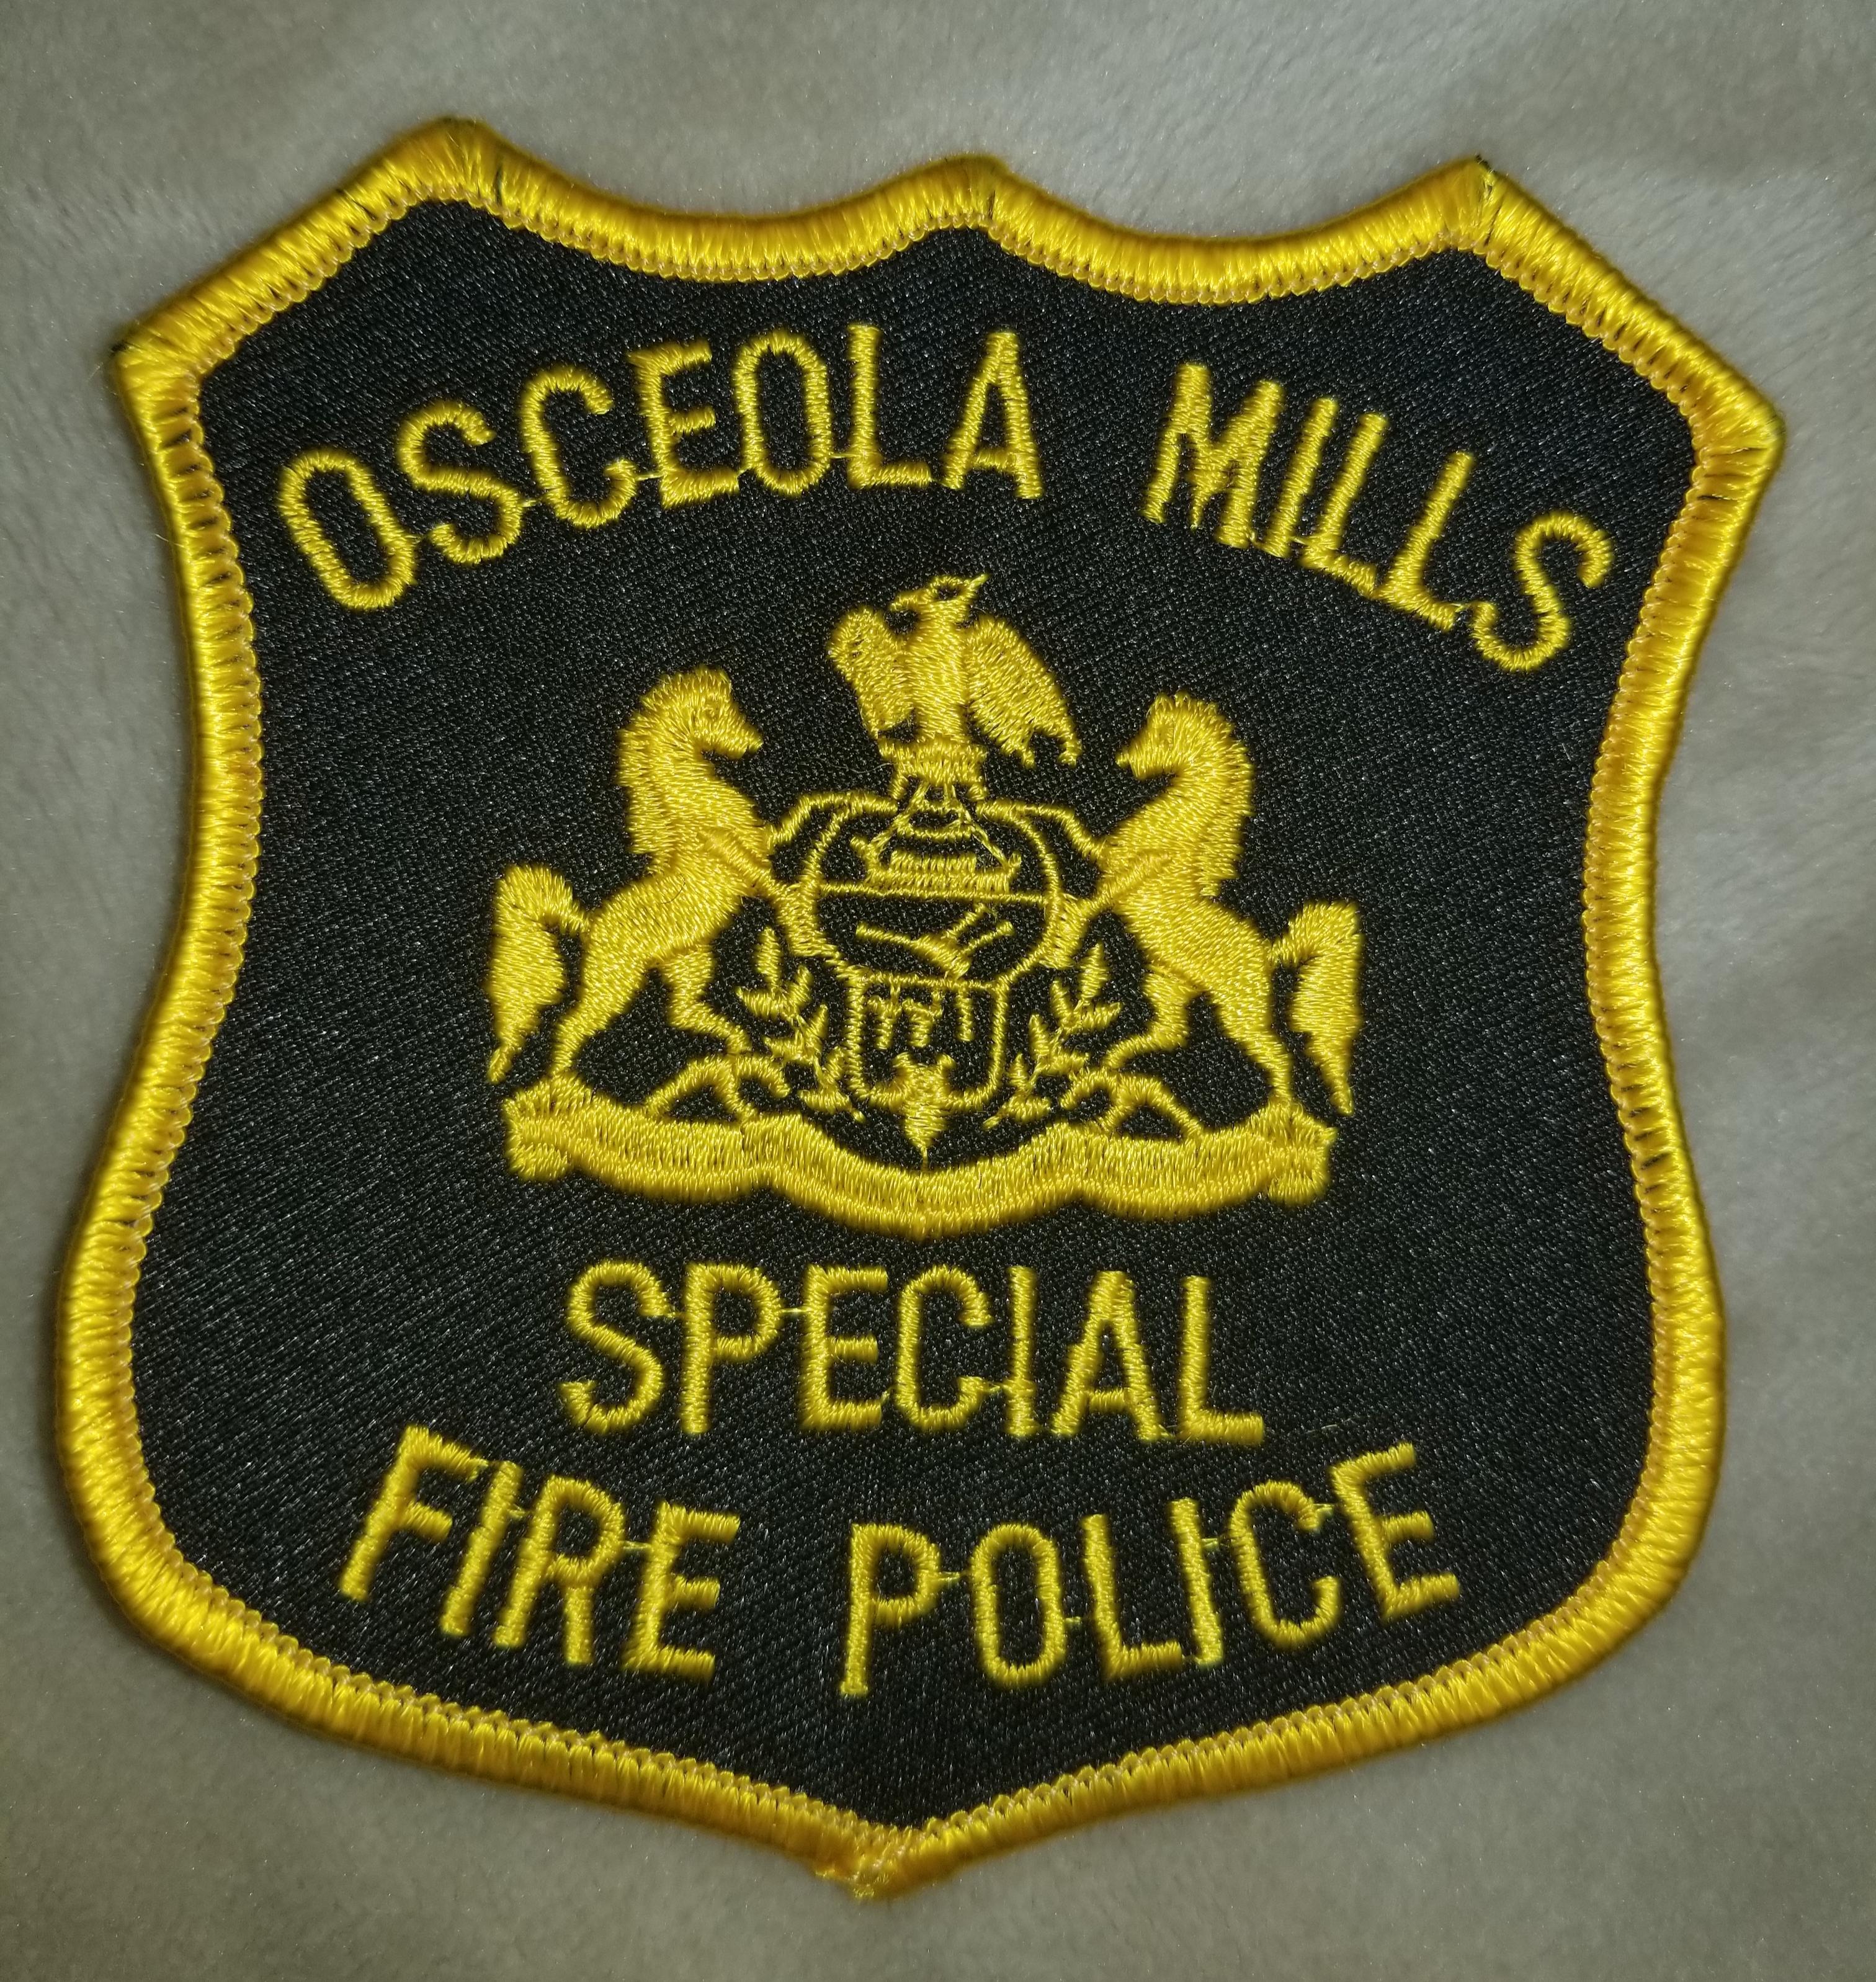 Osceola Mills Fire Police PA